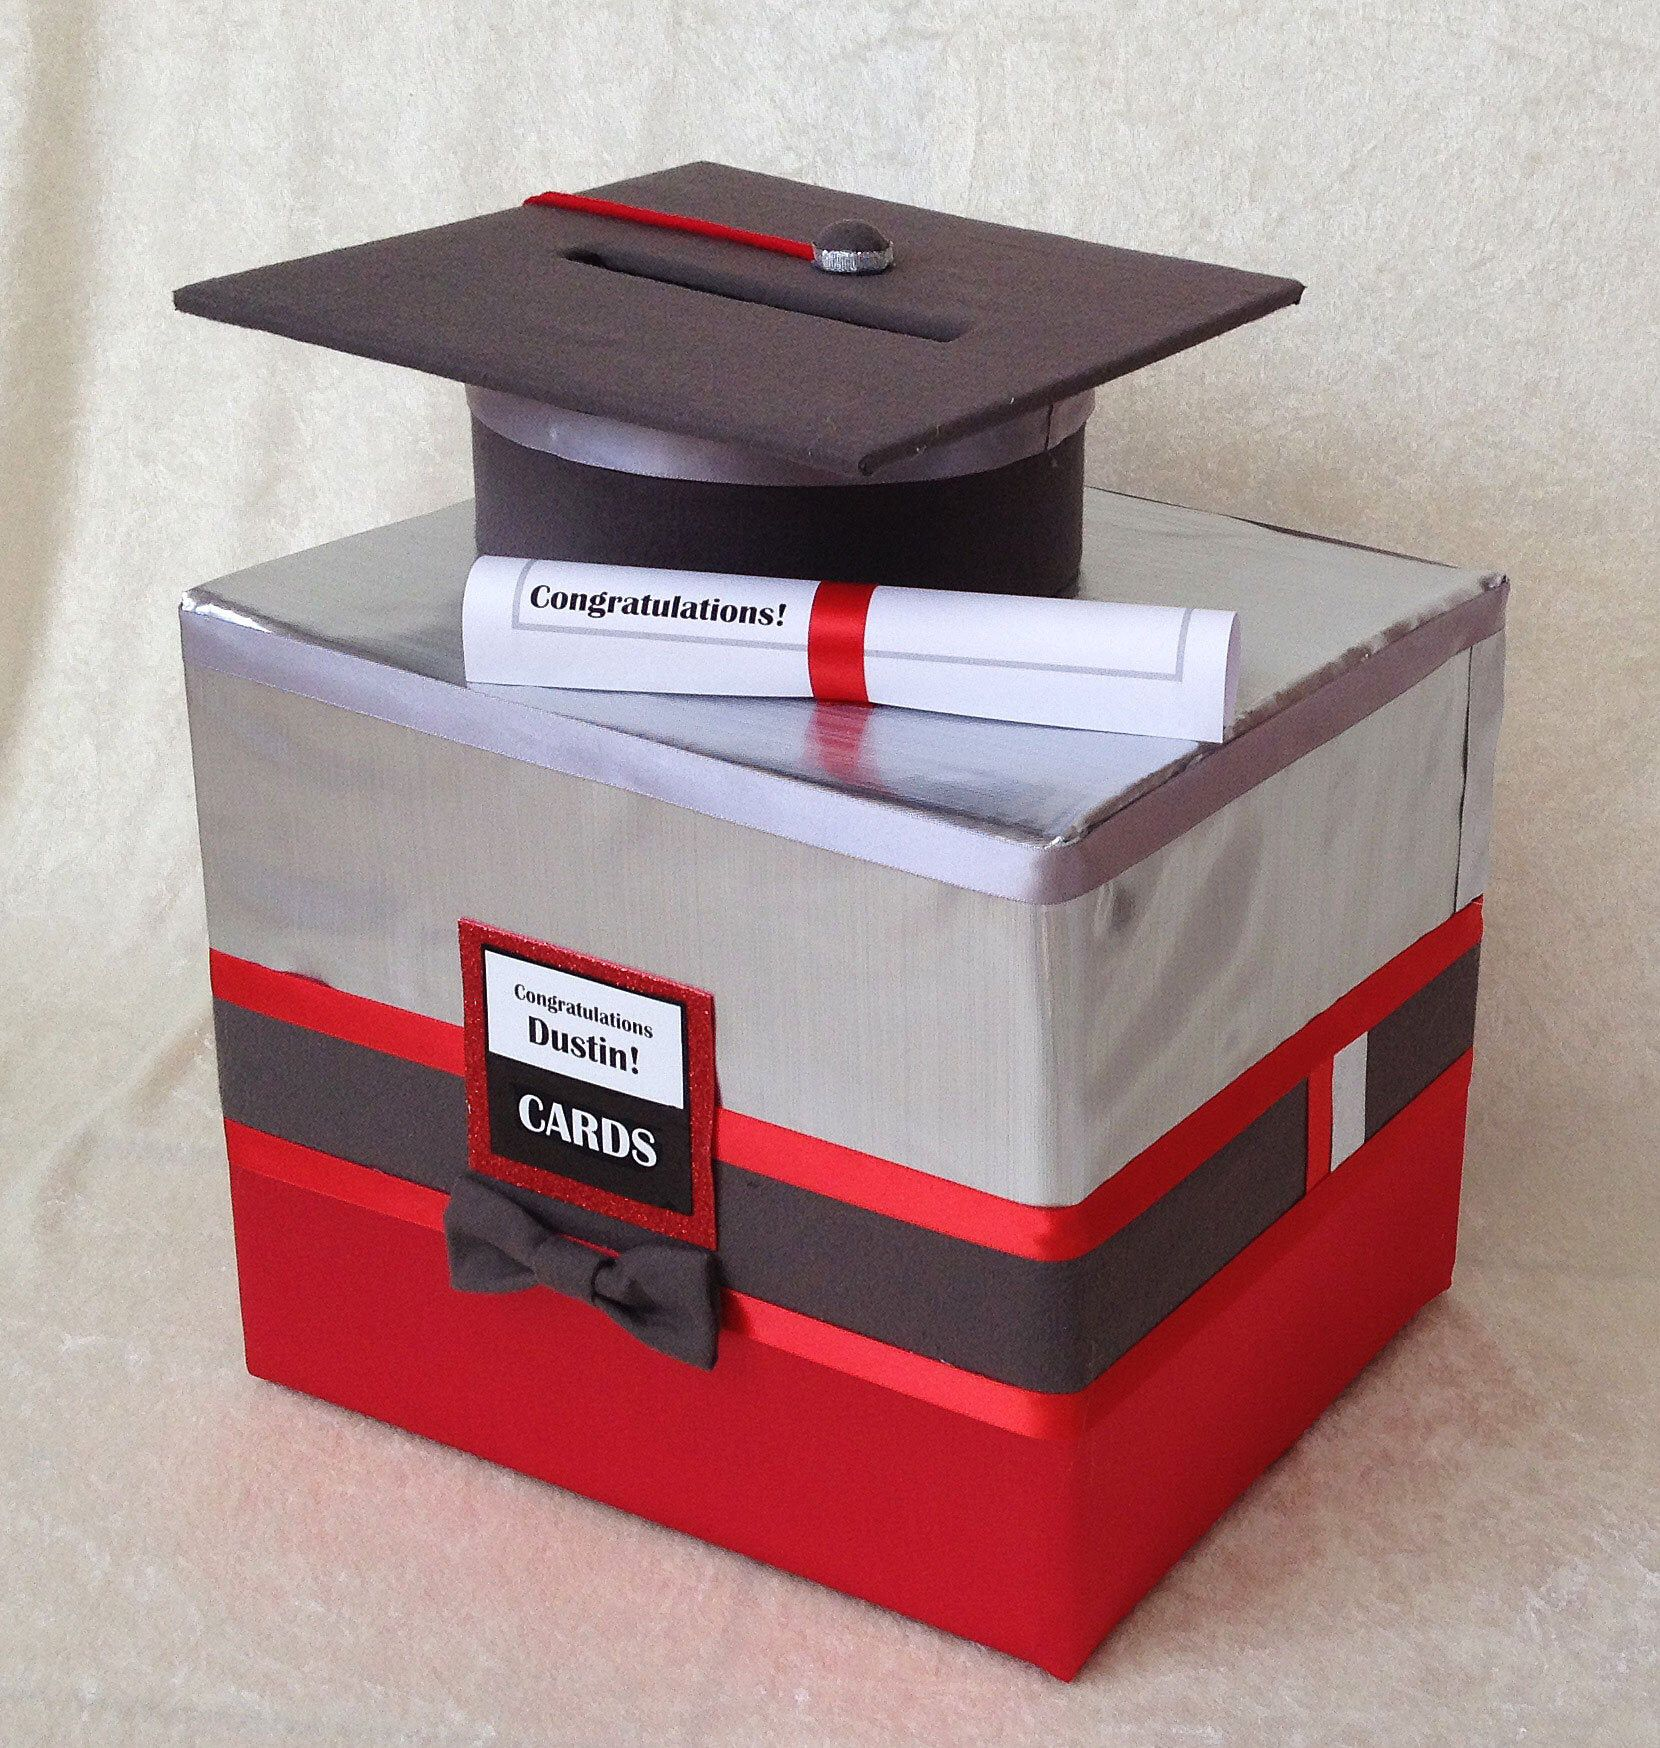 Graduation Party Decorationsgraduation Decorationgraduation Etsy In 2021 Graduation Card Boxes Graduation Party Card Box Graduation Party Decor